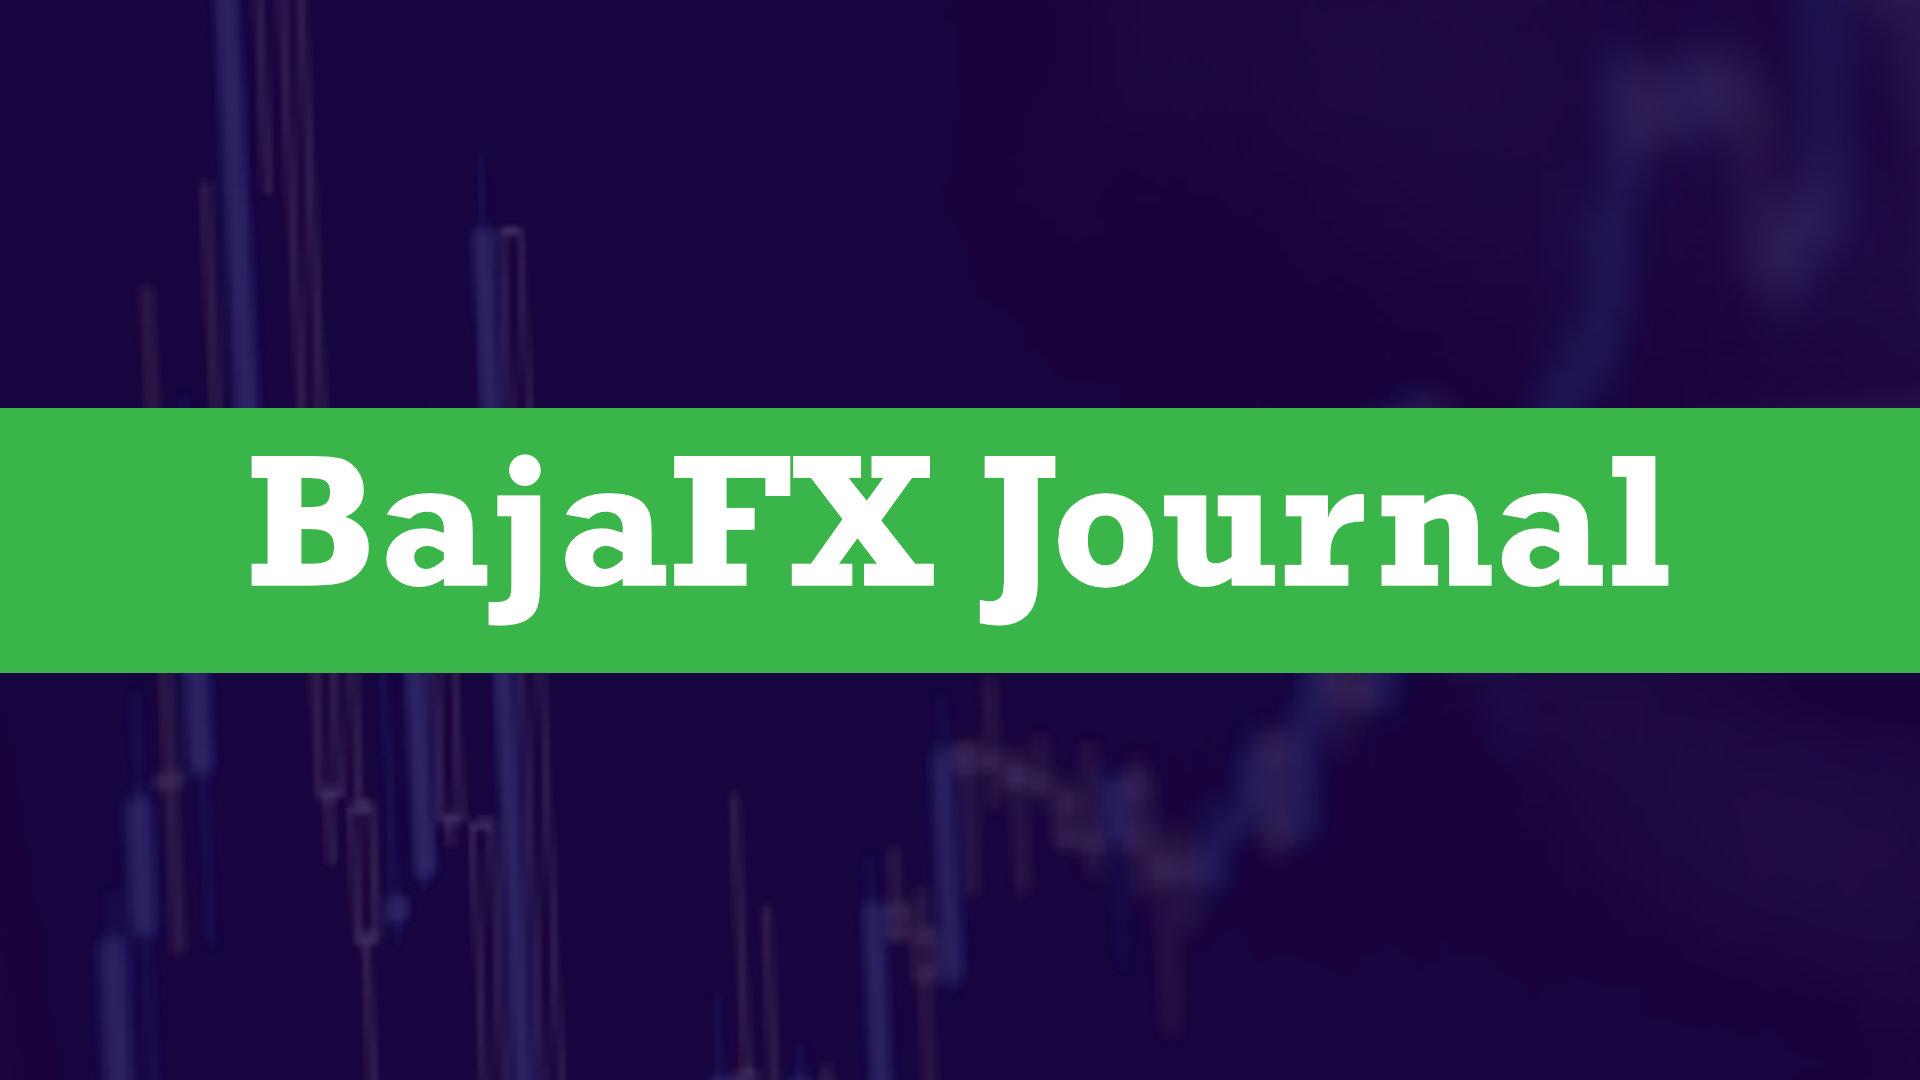 BajaFX Journal